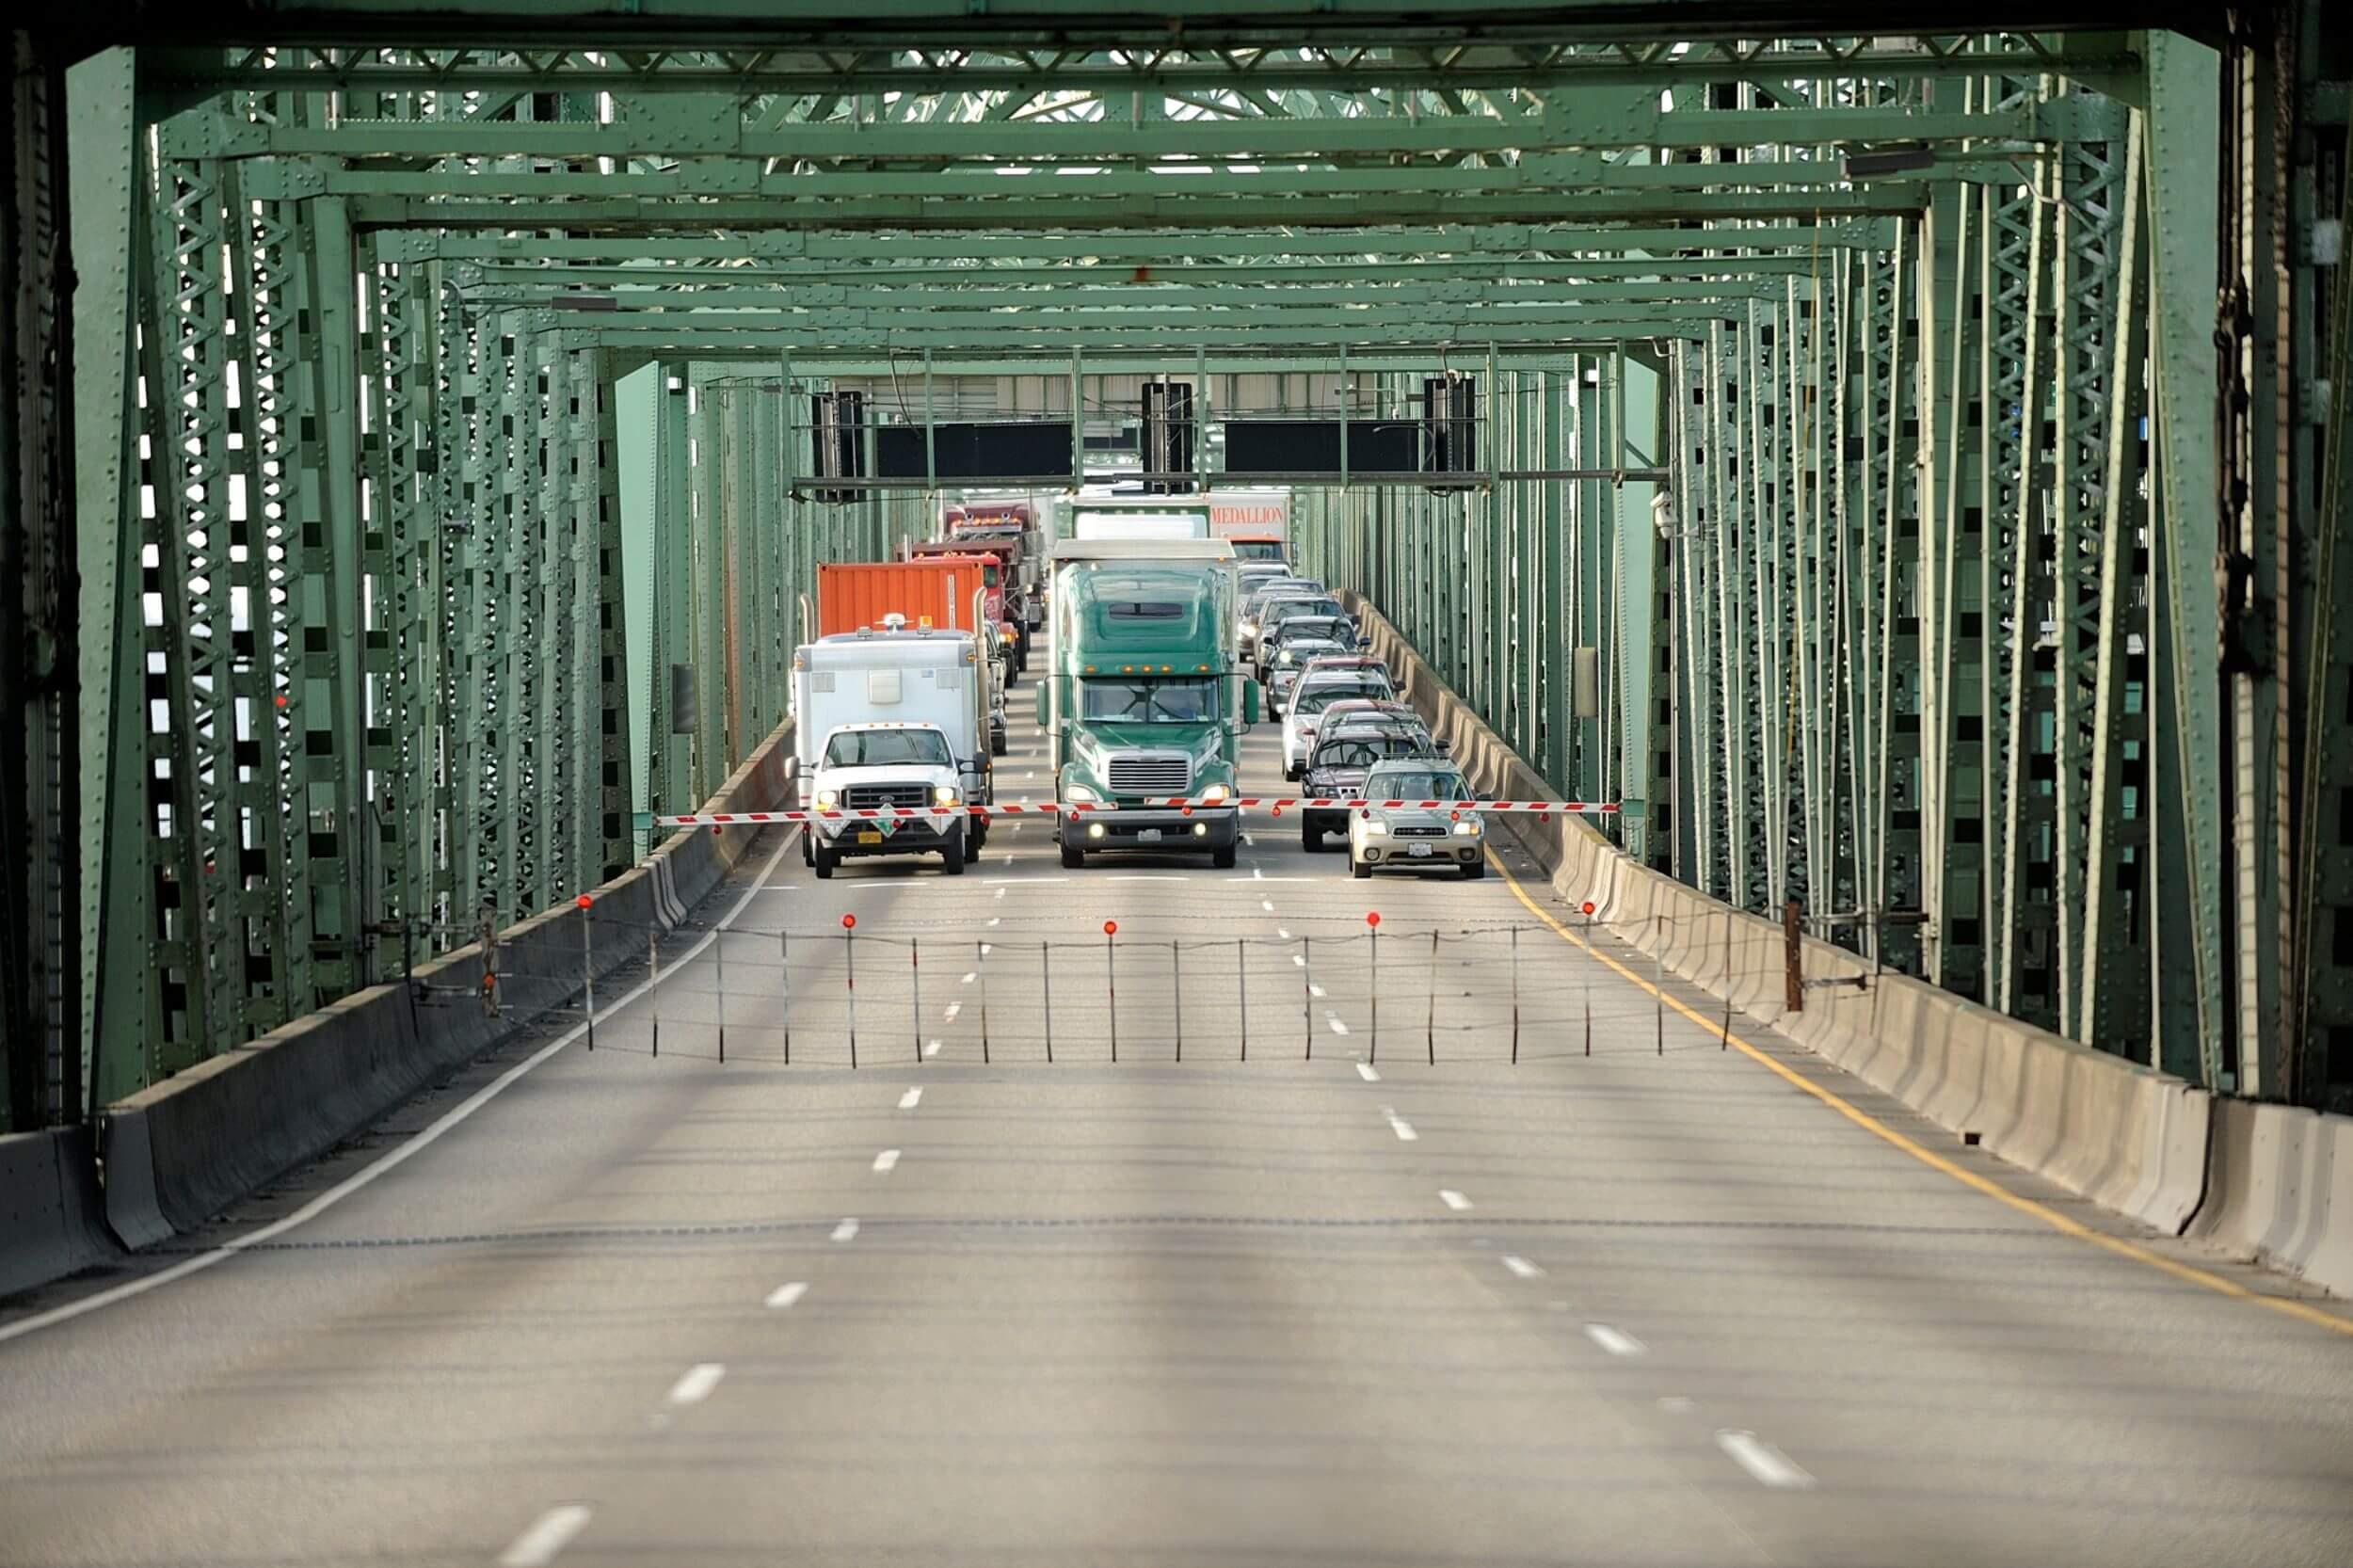 A shot of a car bridge made of green metal.